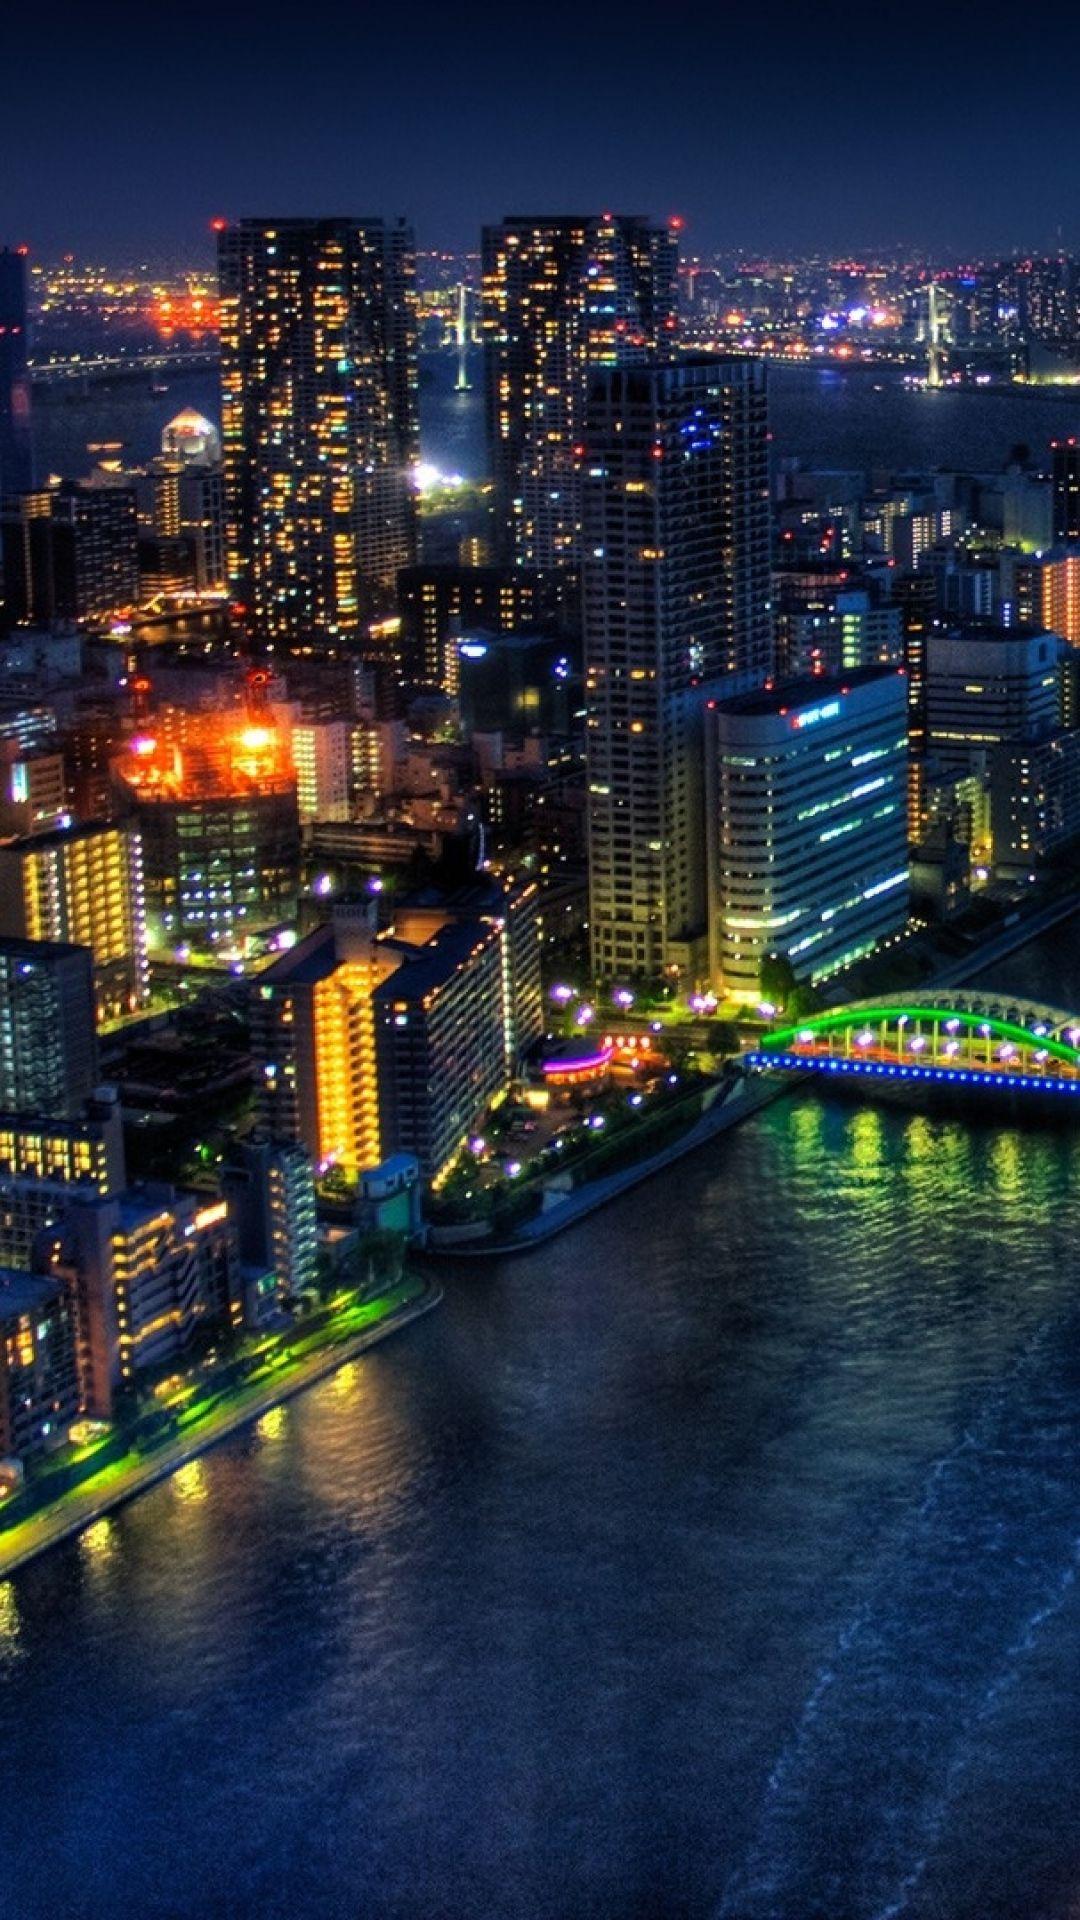 tokyo, bridge, night, buildings, skyscrapers More Japan Heavens, Japan Travel 旅, Plans Tokyo, Japan Seoul, Cityscapes Landscape, Amazing Japan, ️Japan ️